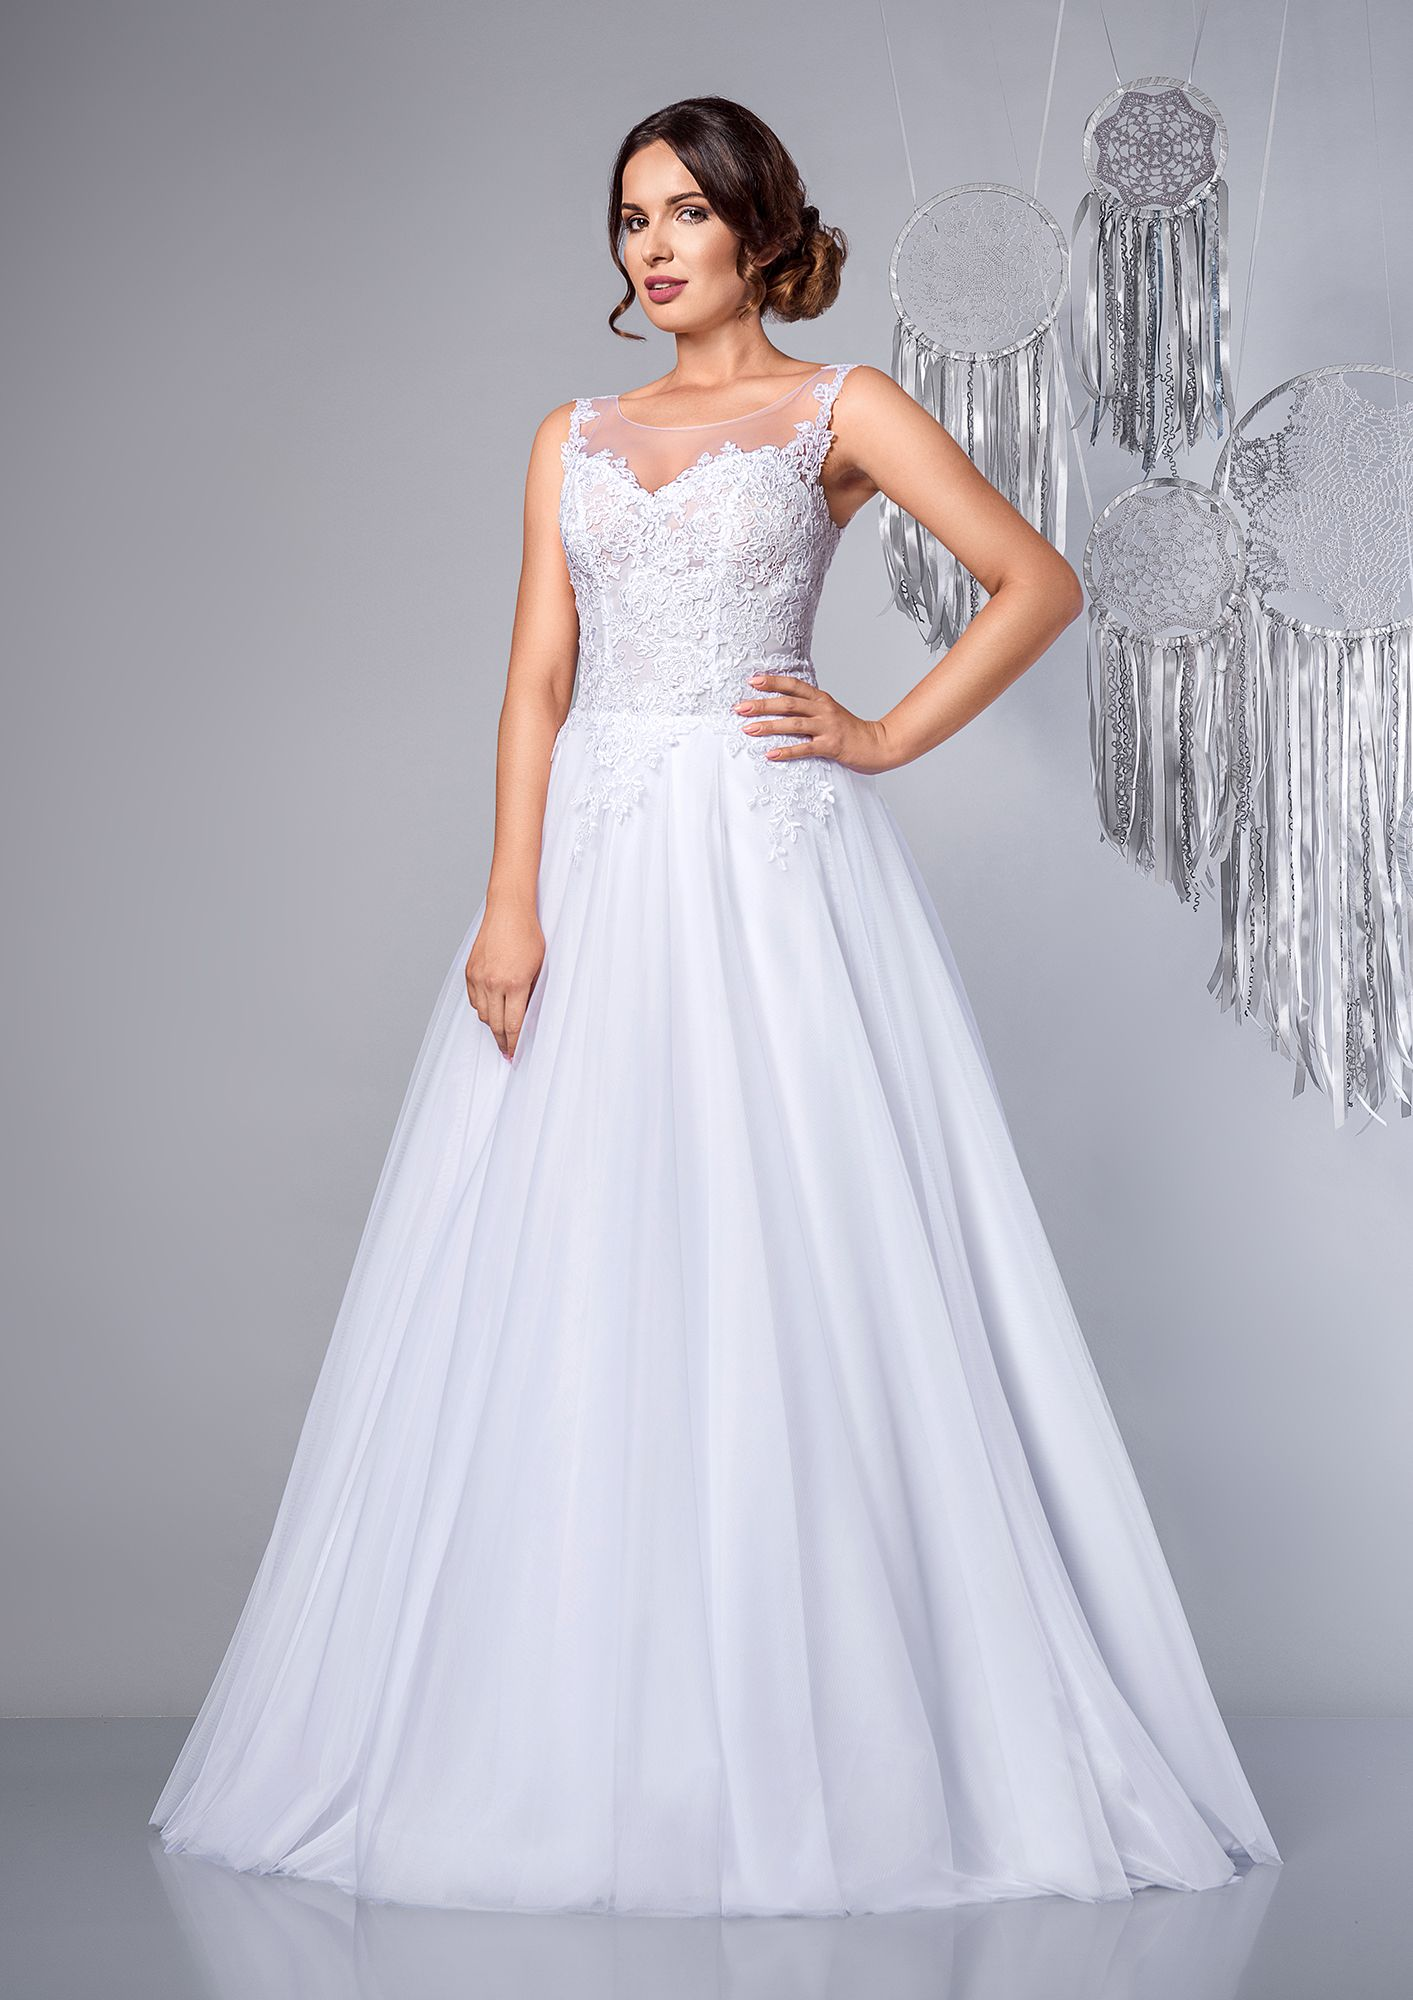 Nice Suknia ślubna Litera A Tiule A Line Tulle Romantic Wedding